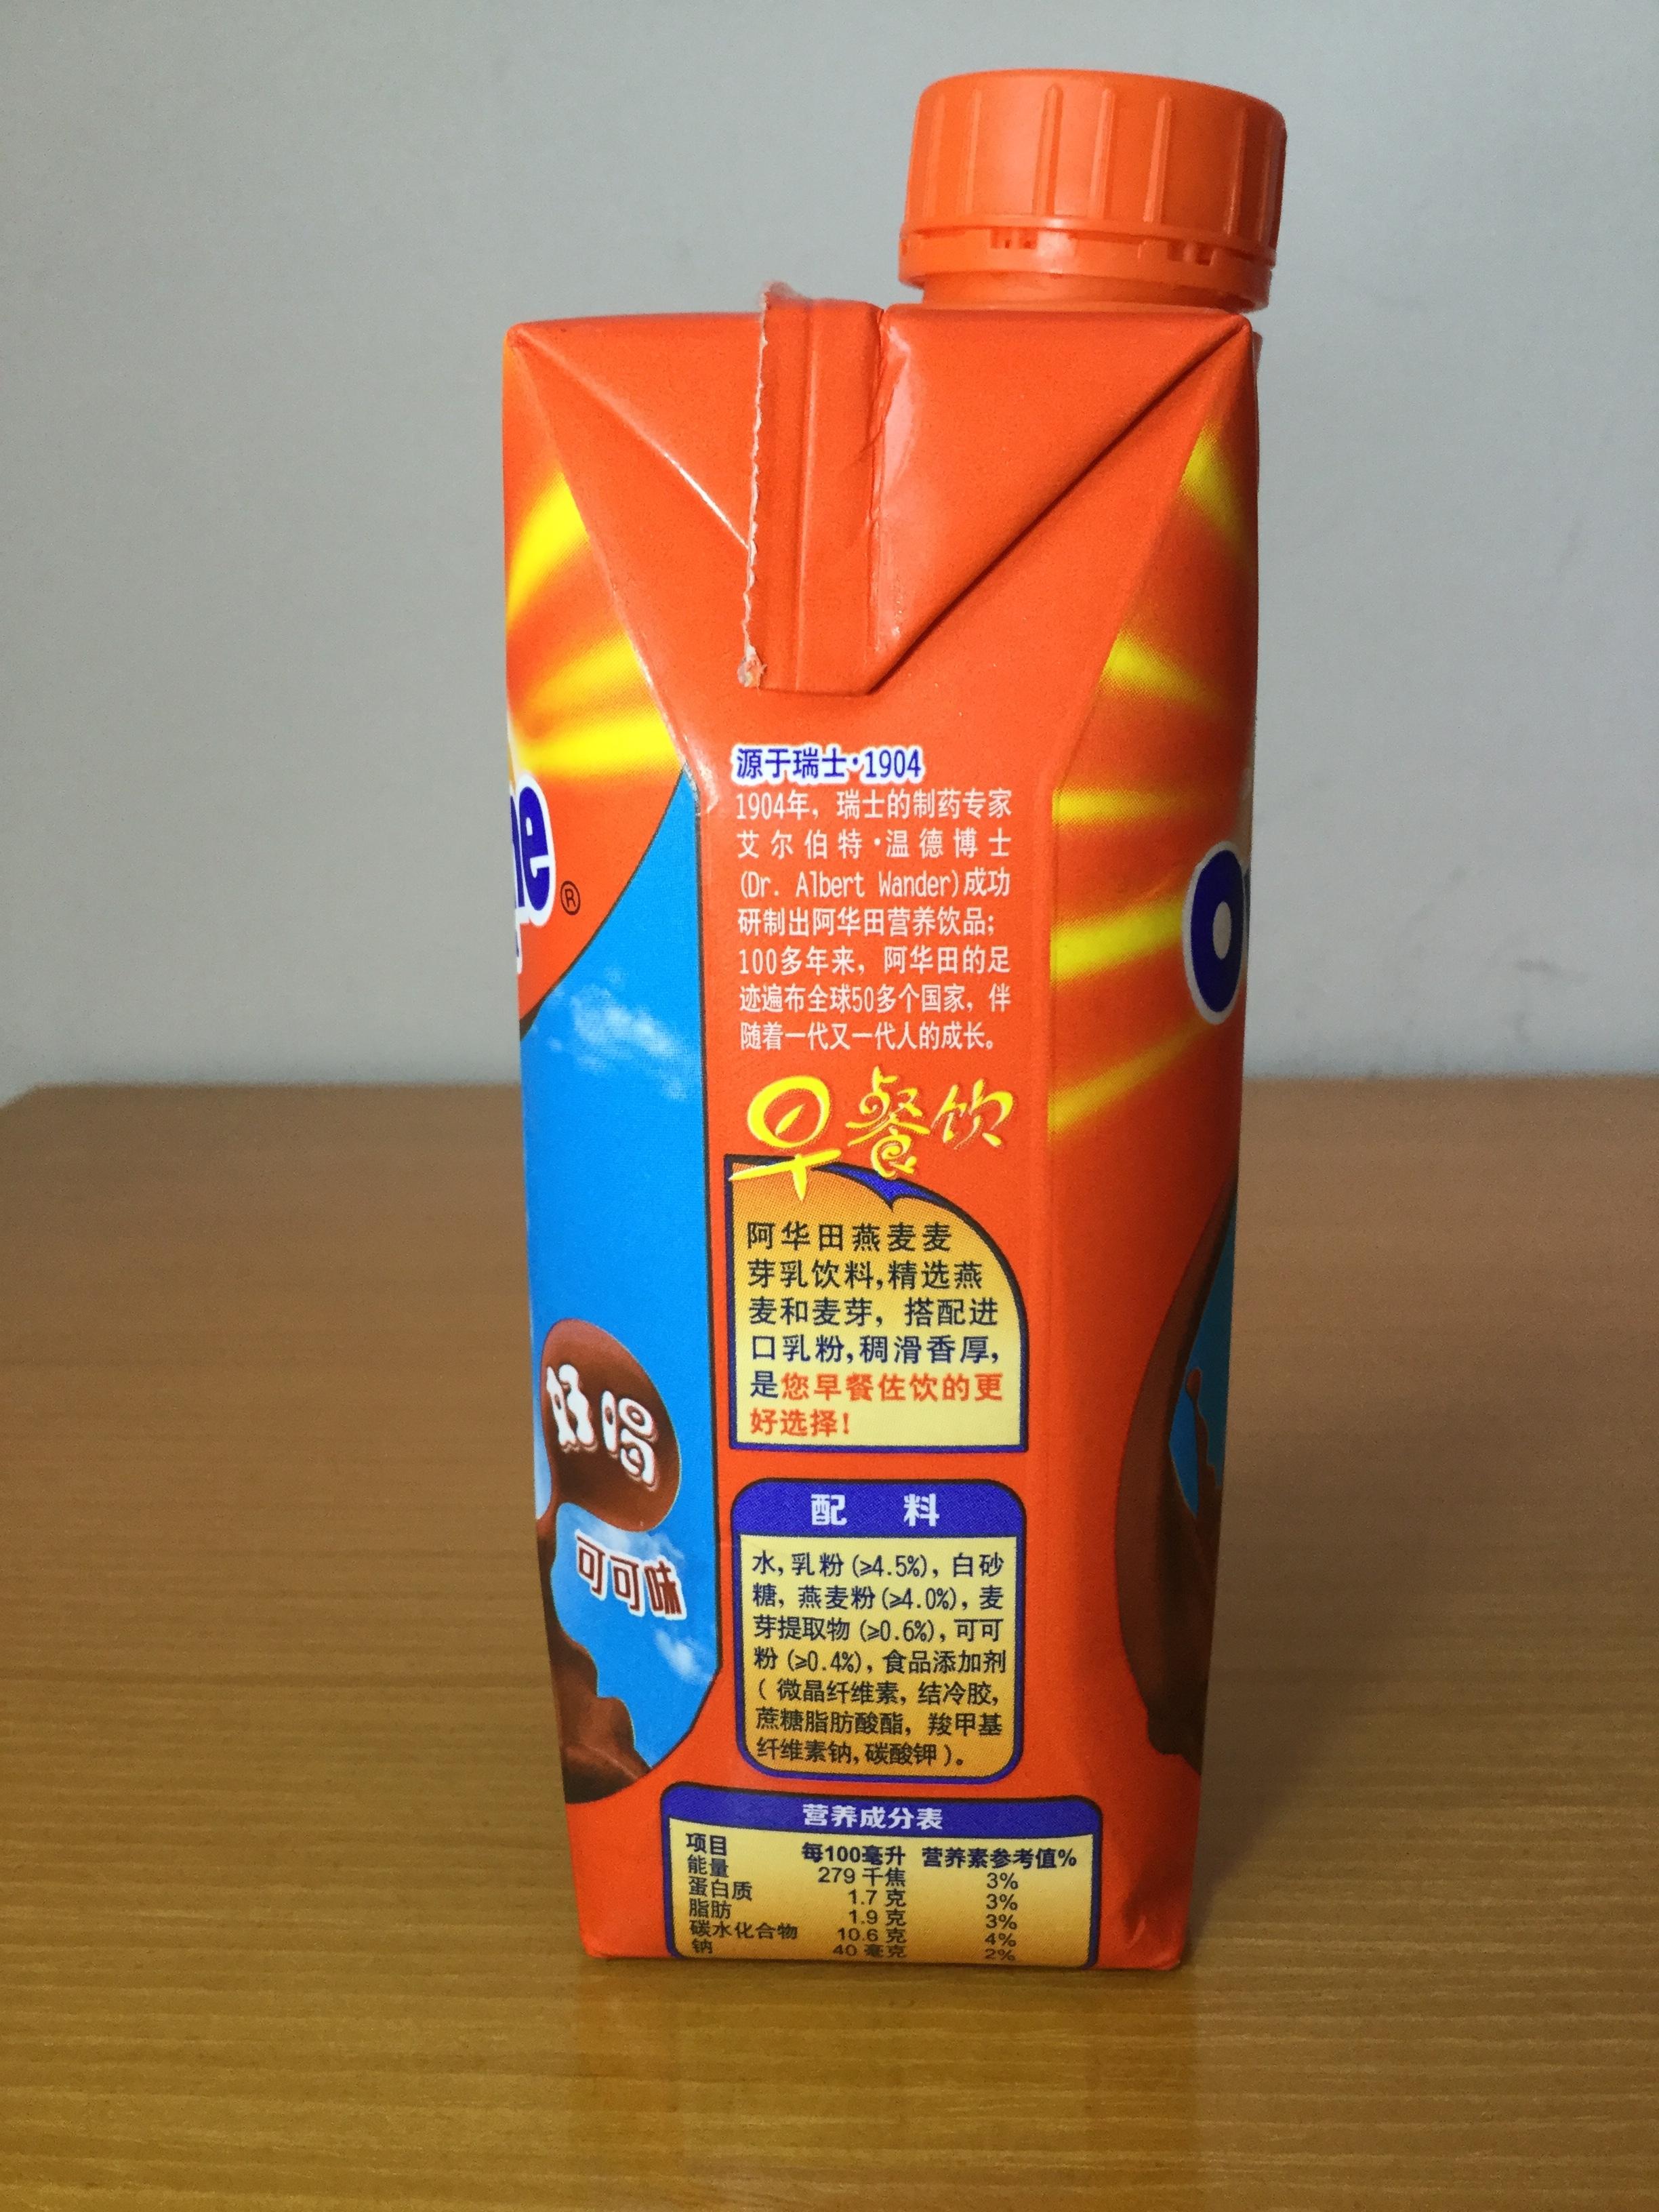 Ovaltine Malt Milk Side 1